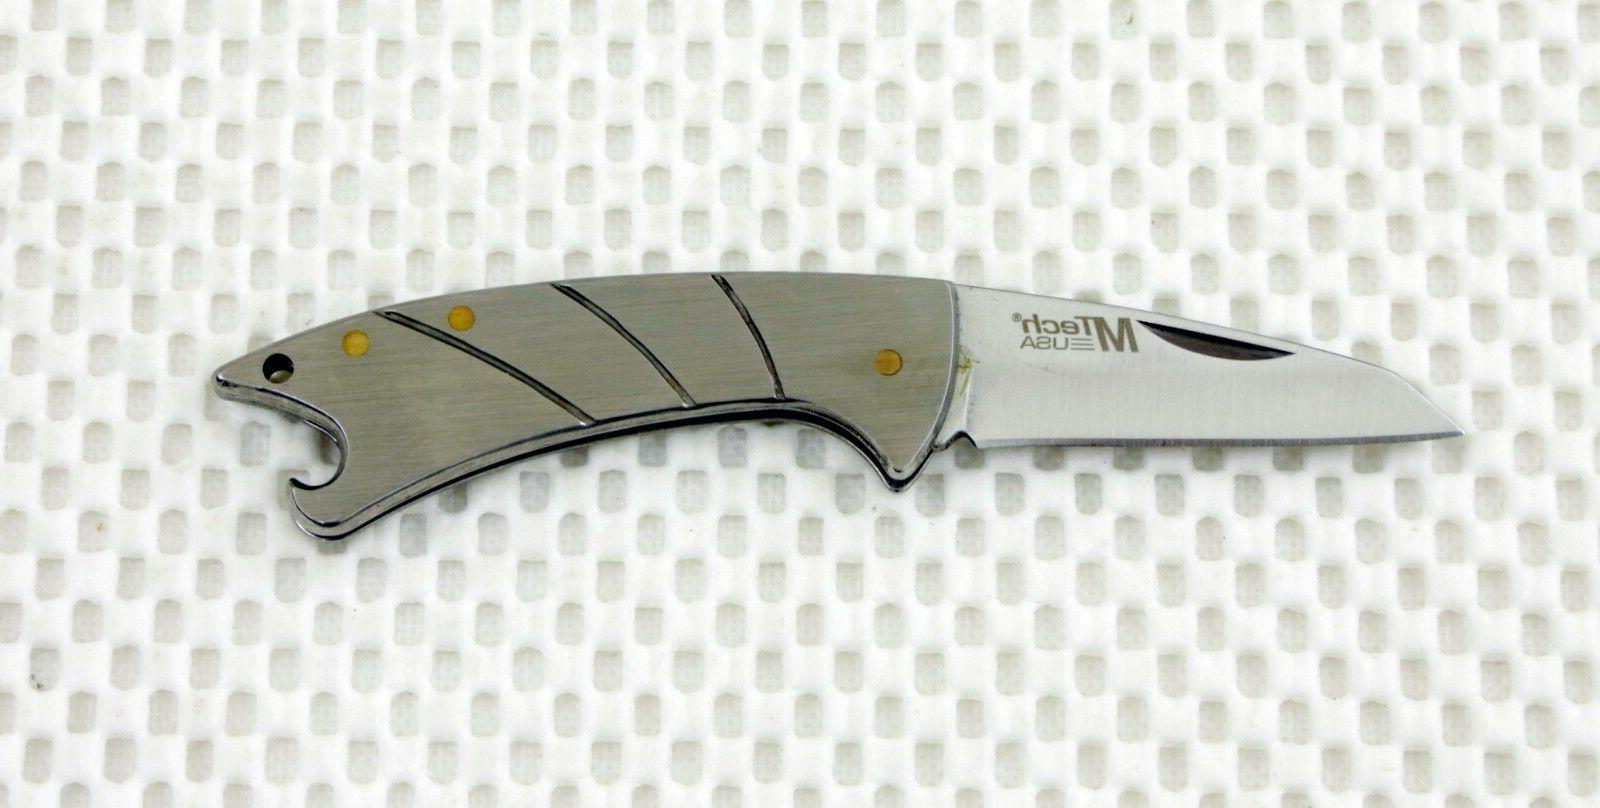 mt 982 very thin folding pocket knife